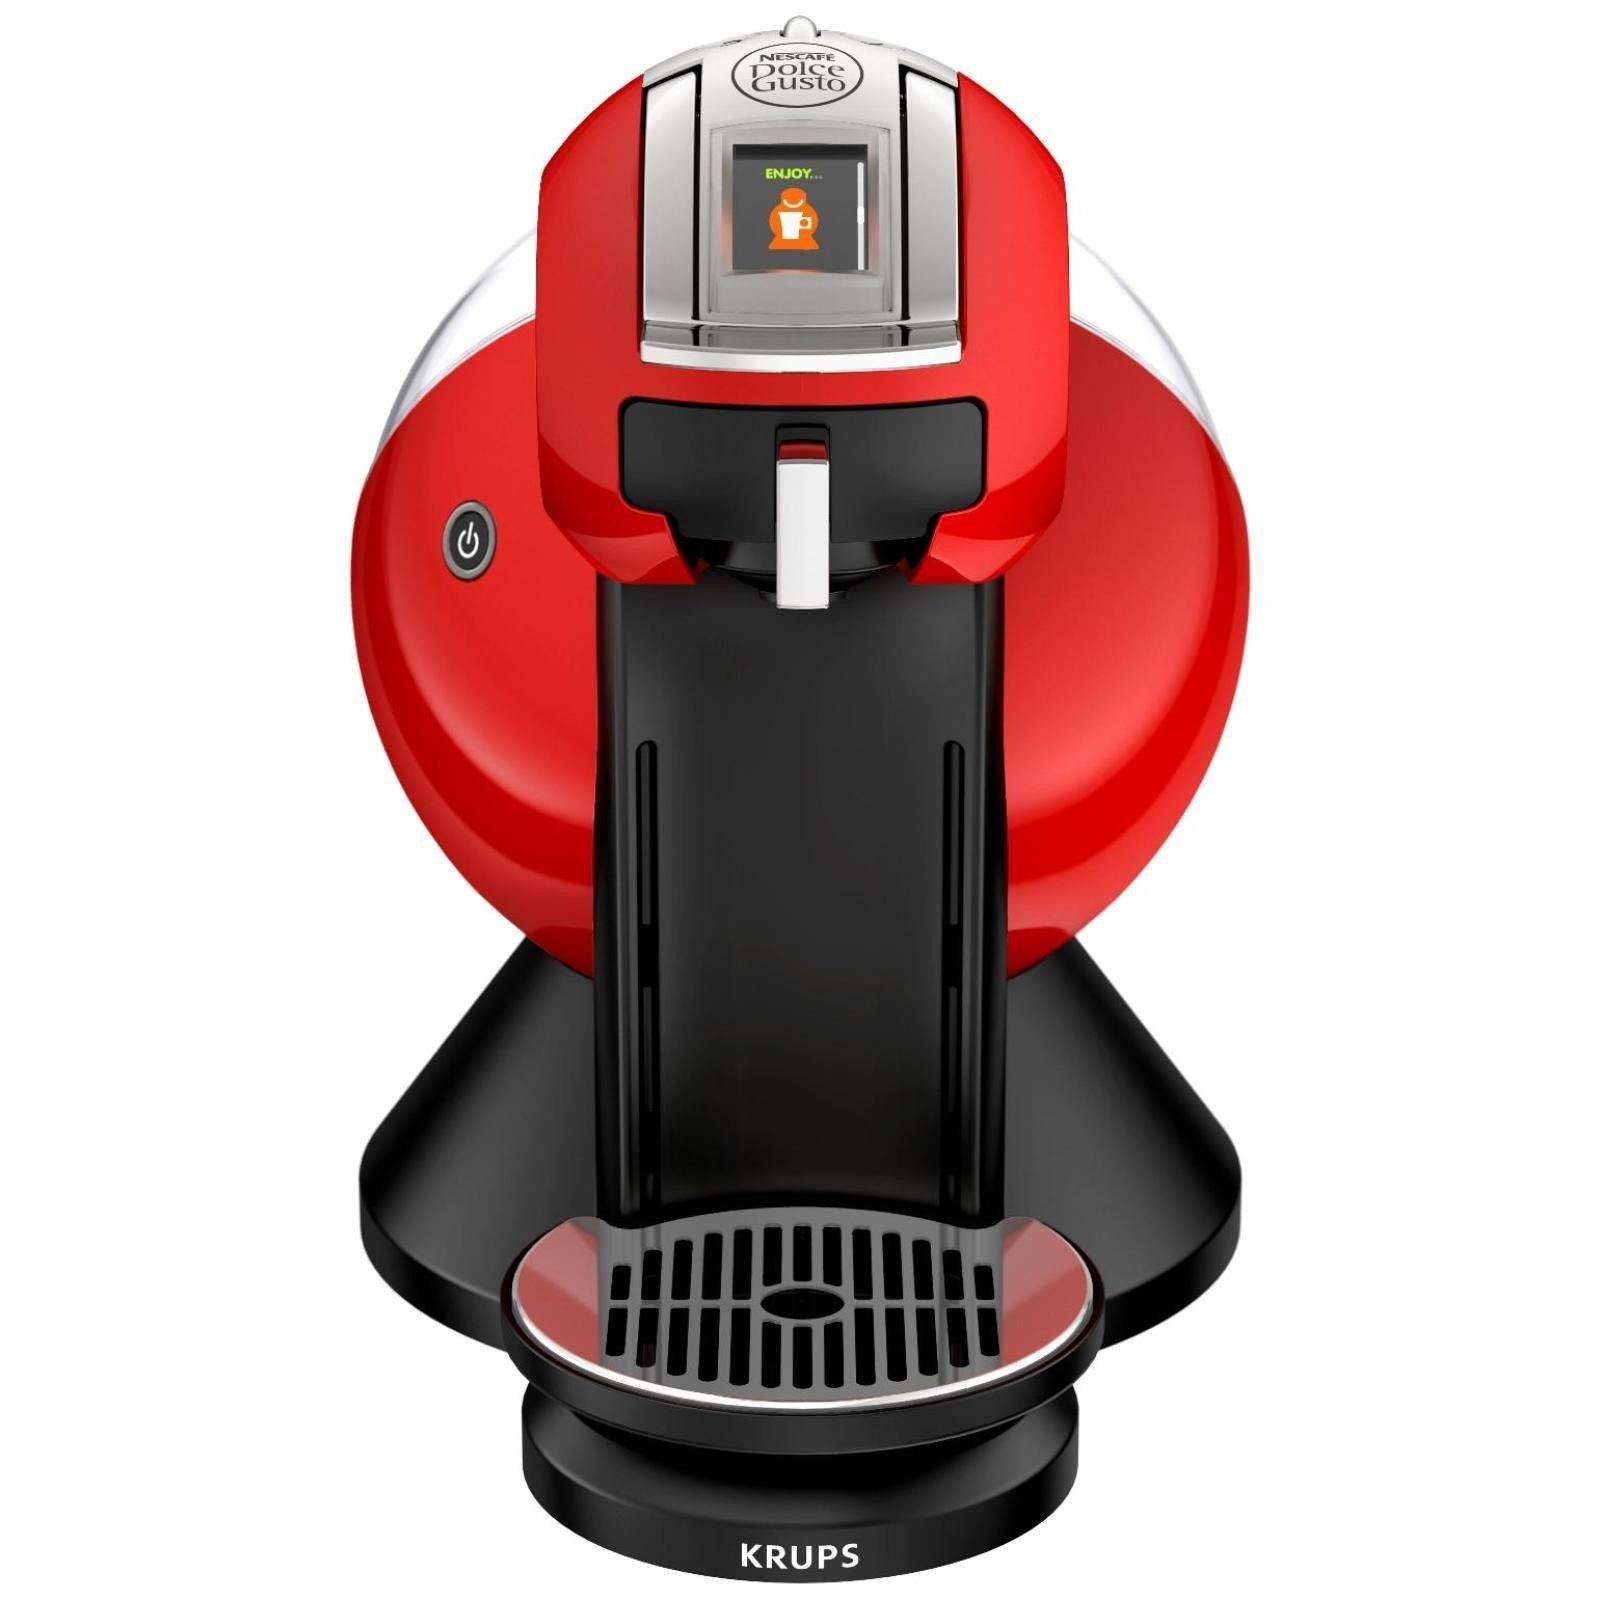 Espressor multi beverage Krups KP2606E2 , presiune 15 bari, capacitate 1,5 L, rosu